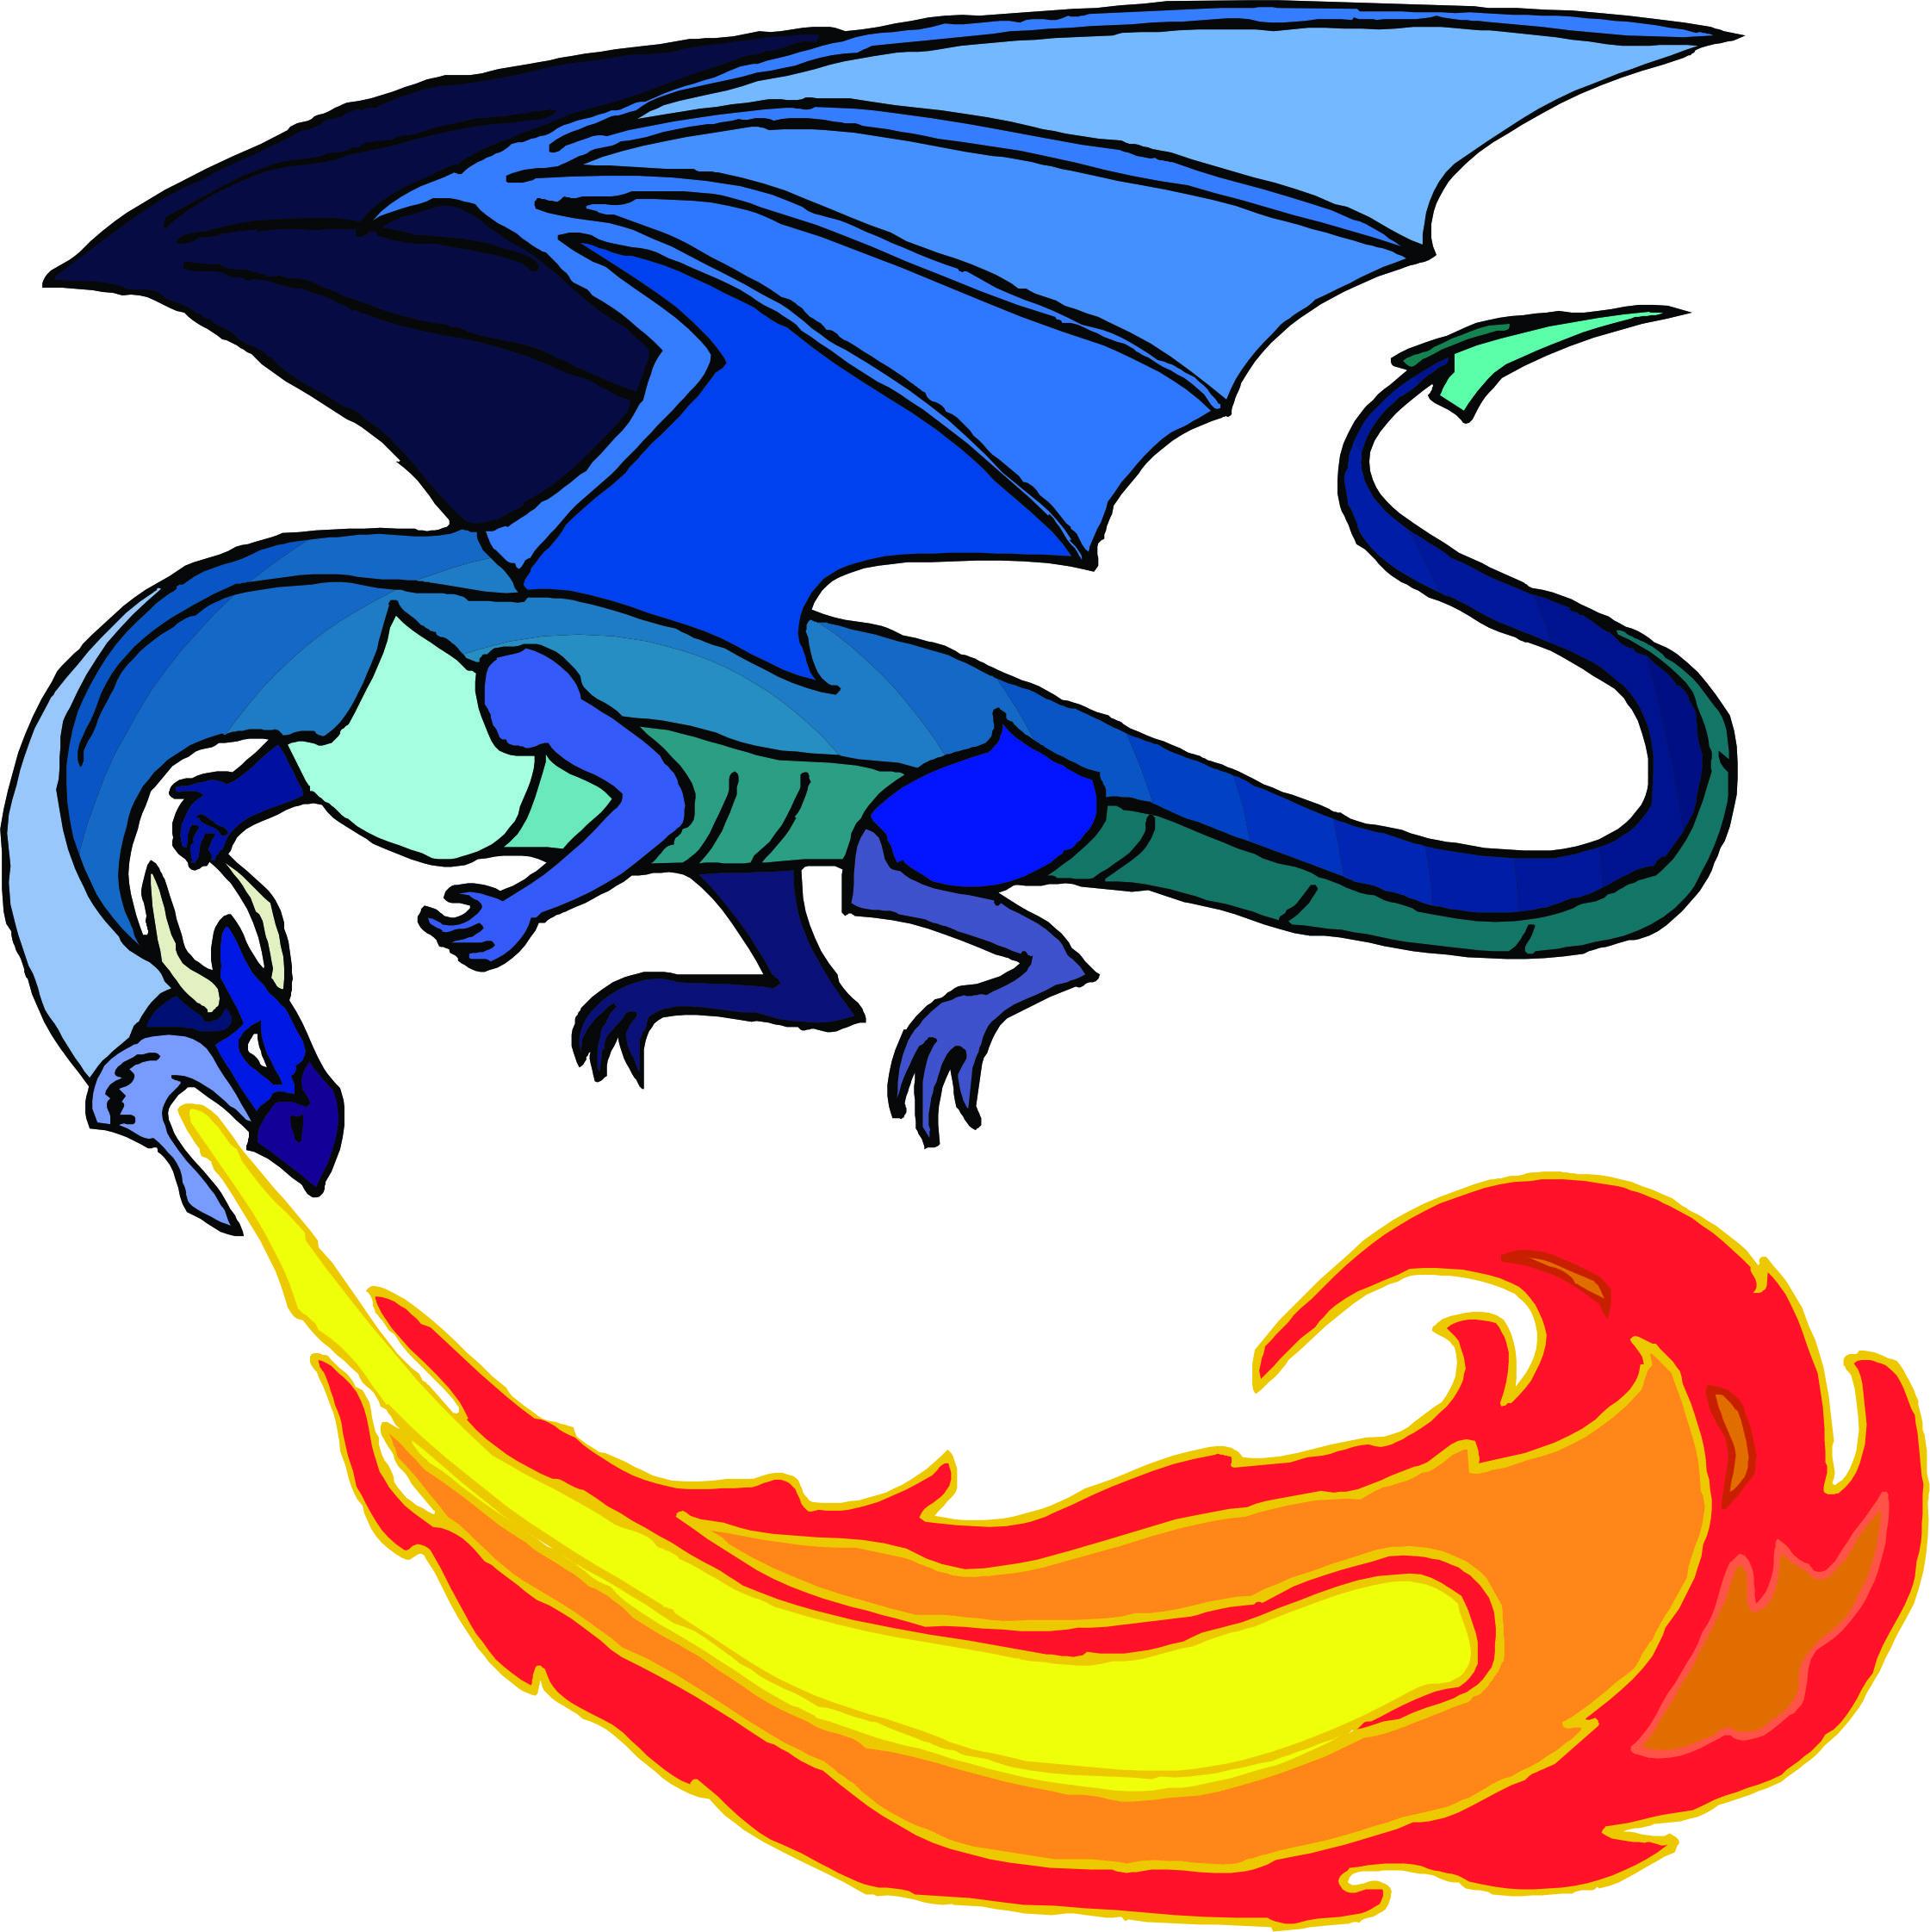 2241x2243 Dragon Clip Art Images Free Clipart 4